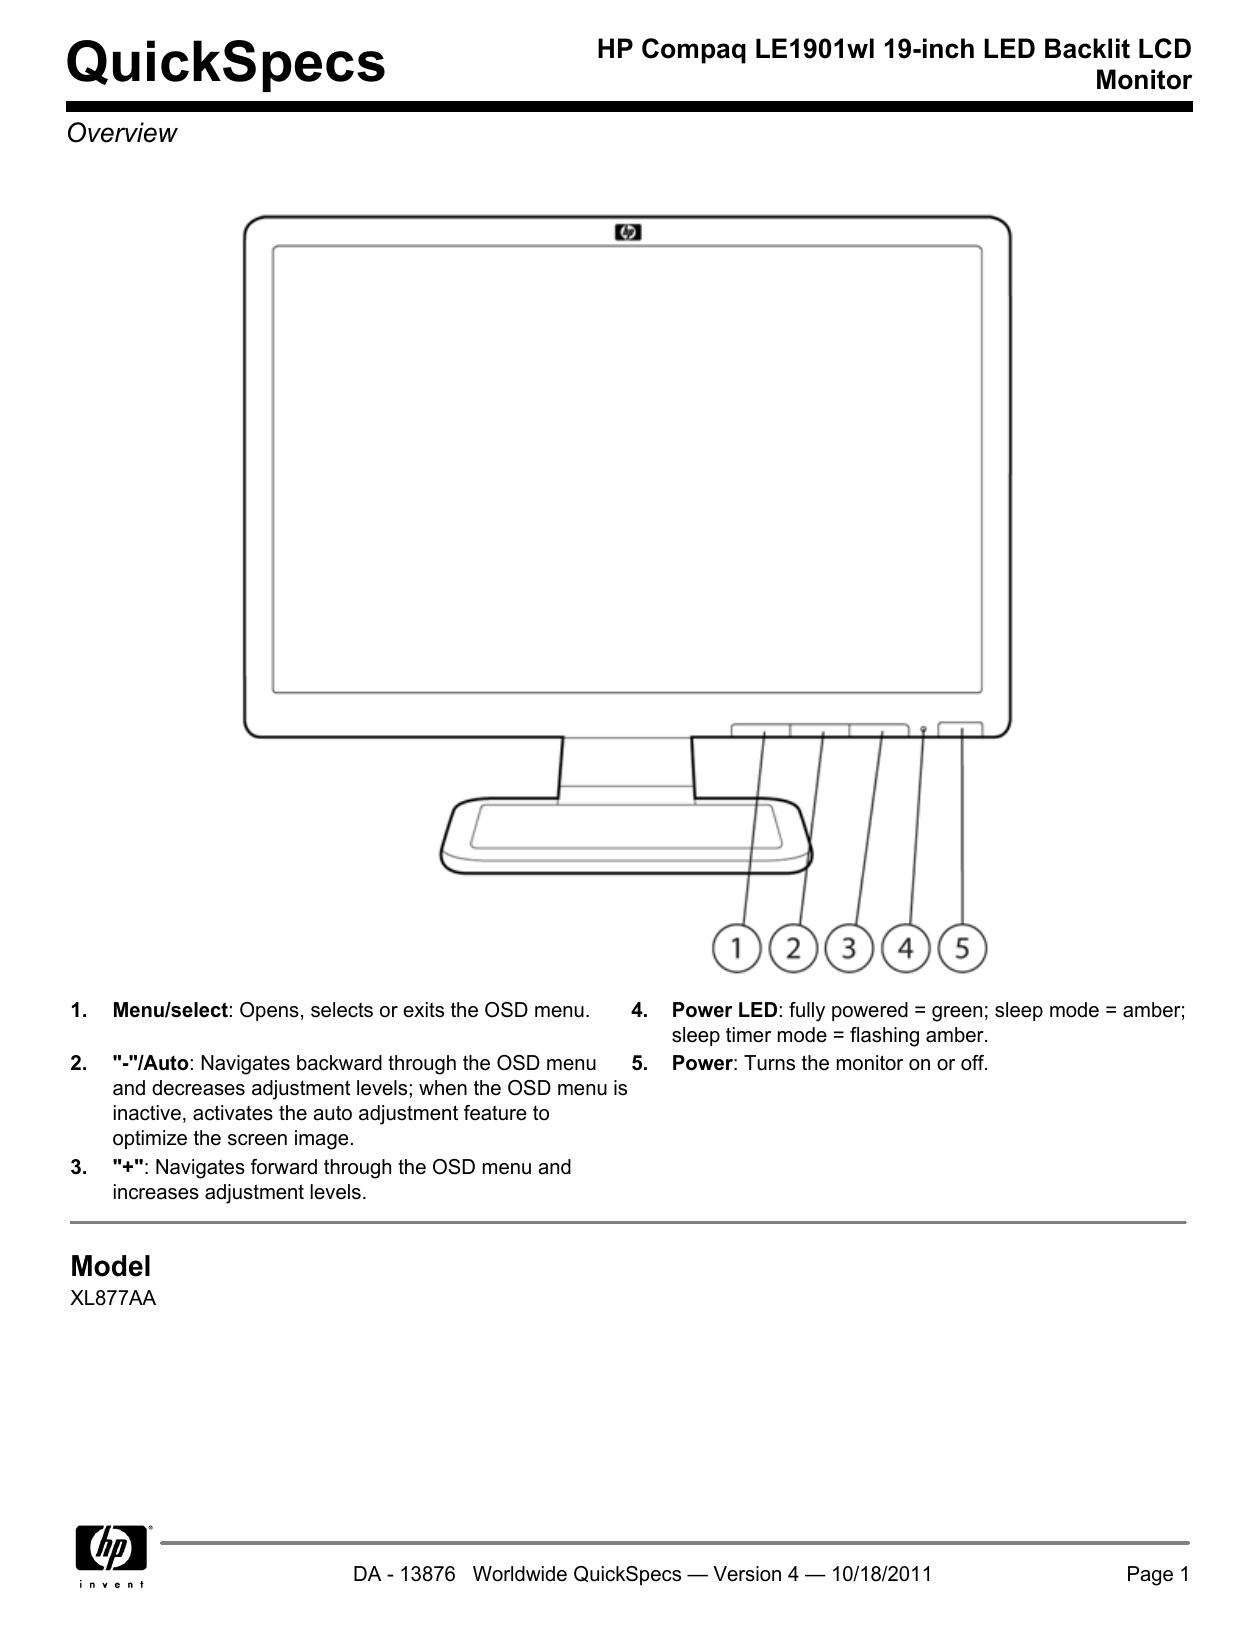 HP Compaq LE1901wl 19-inch LED Backlit LCD Monitor | manualzz com